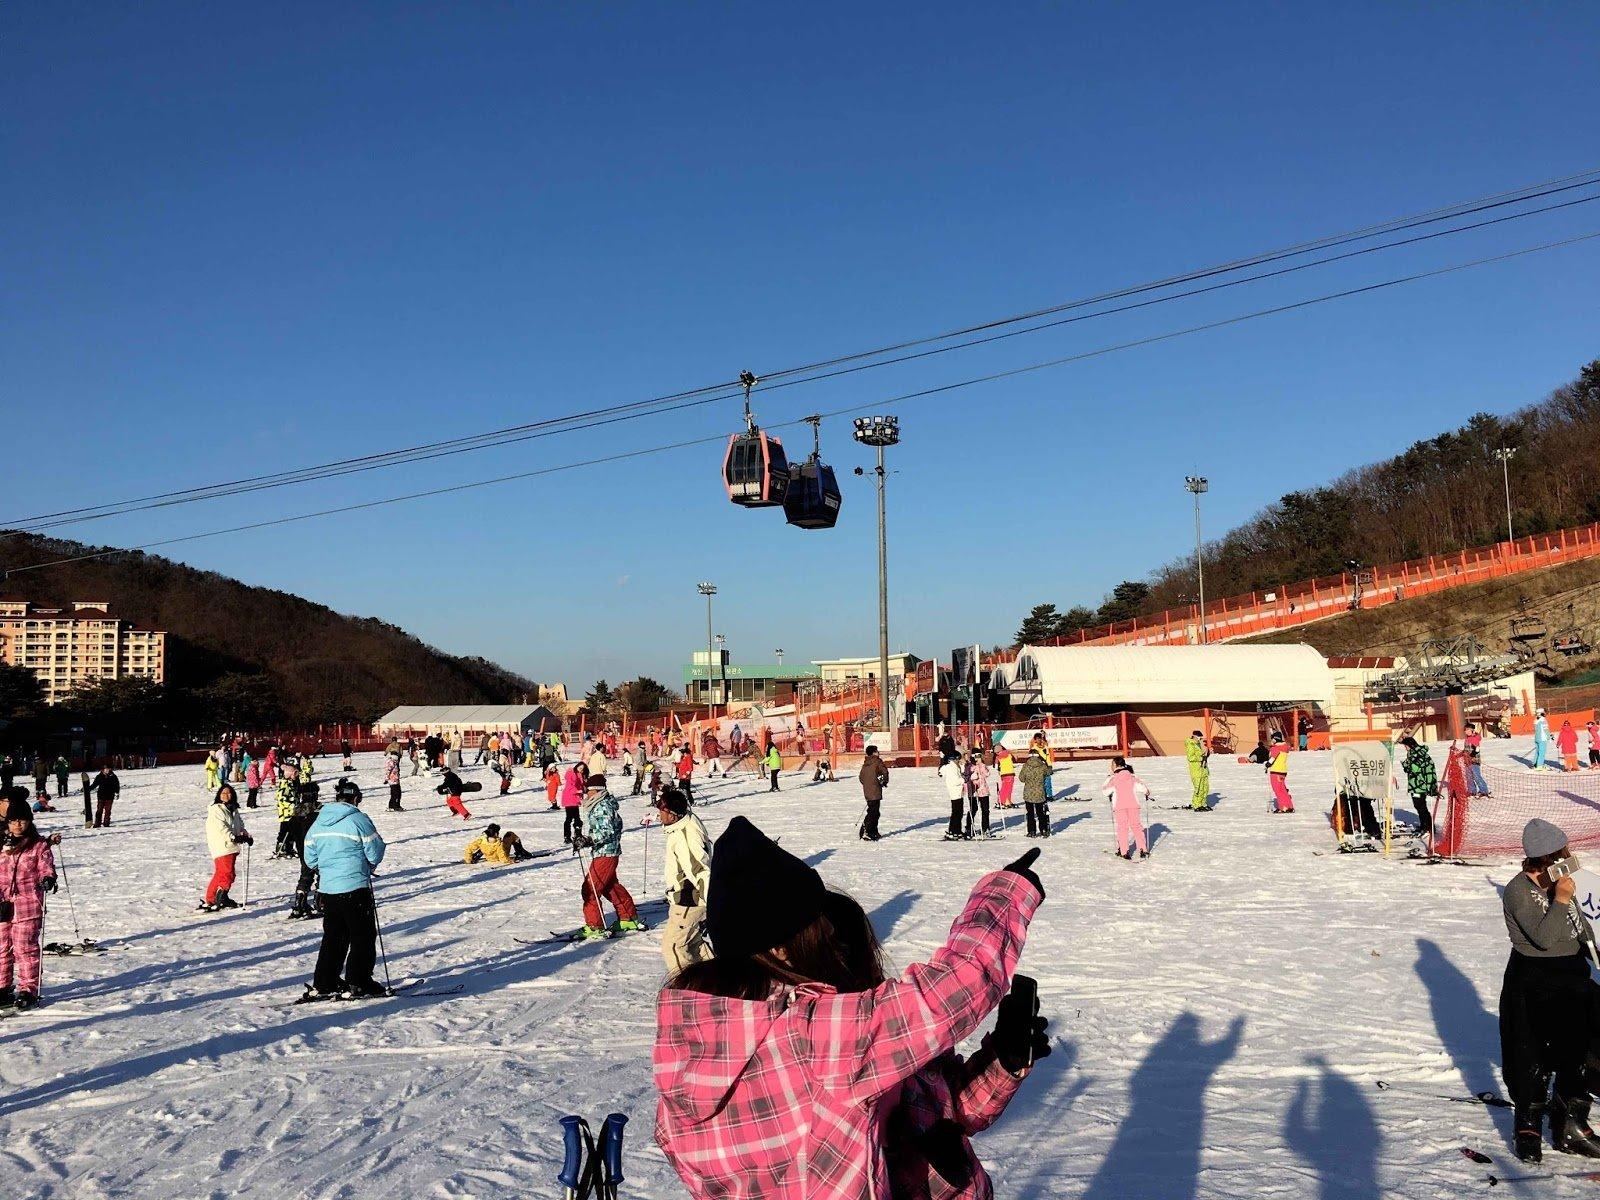 Vivaldi Ski Park